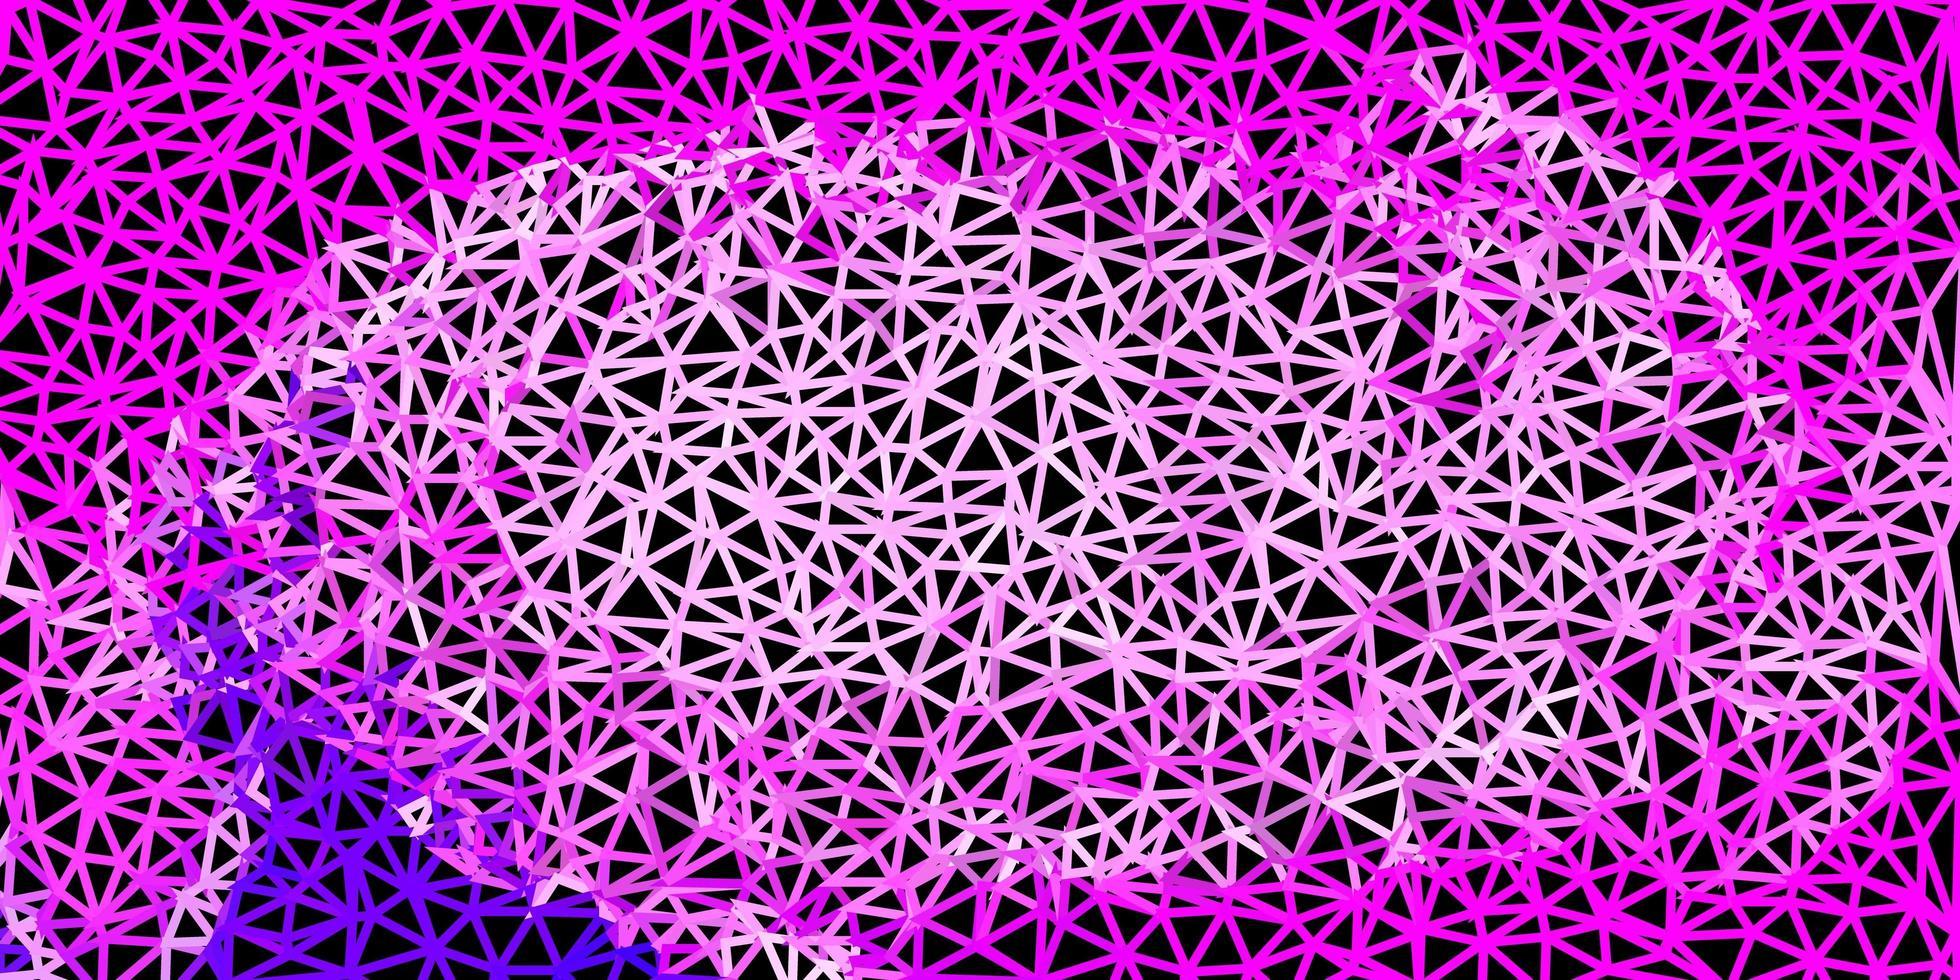 hellrosa Vektor abstrakte Dreieck Textur.